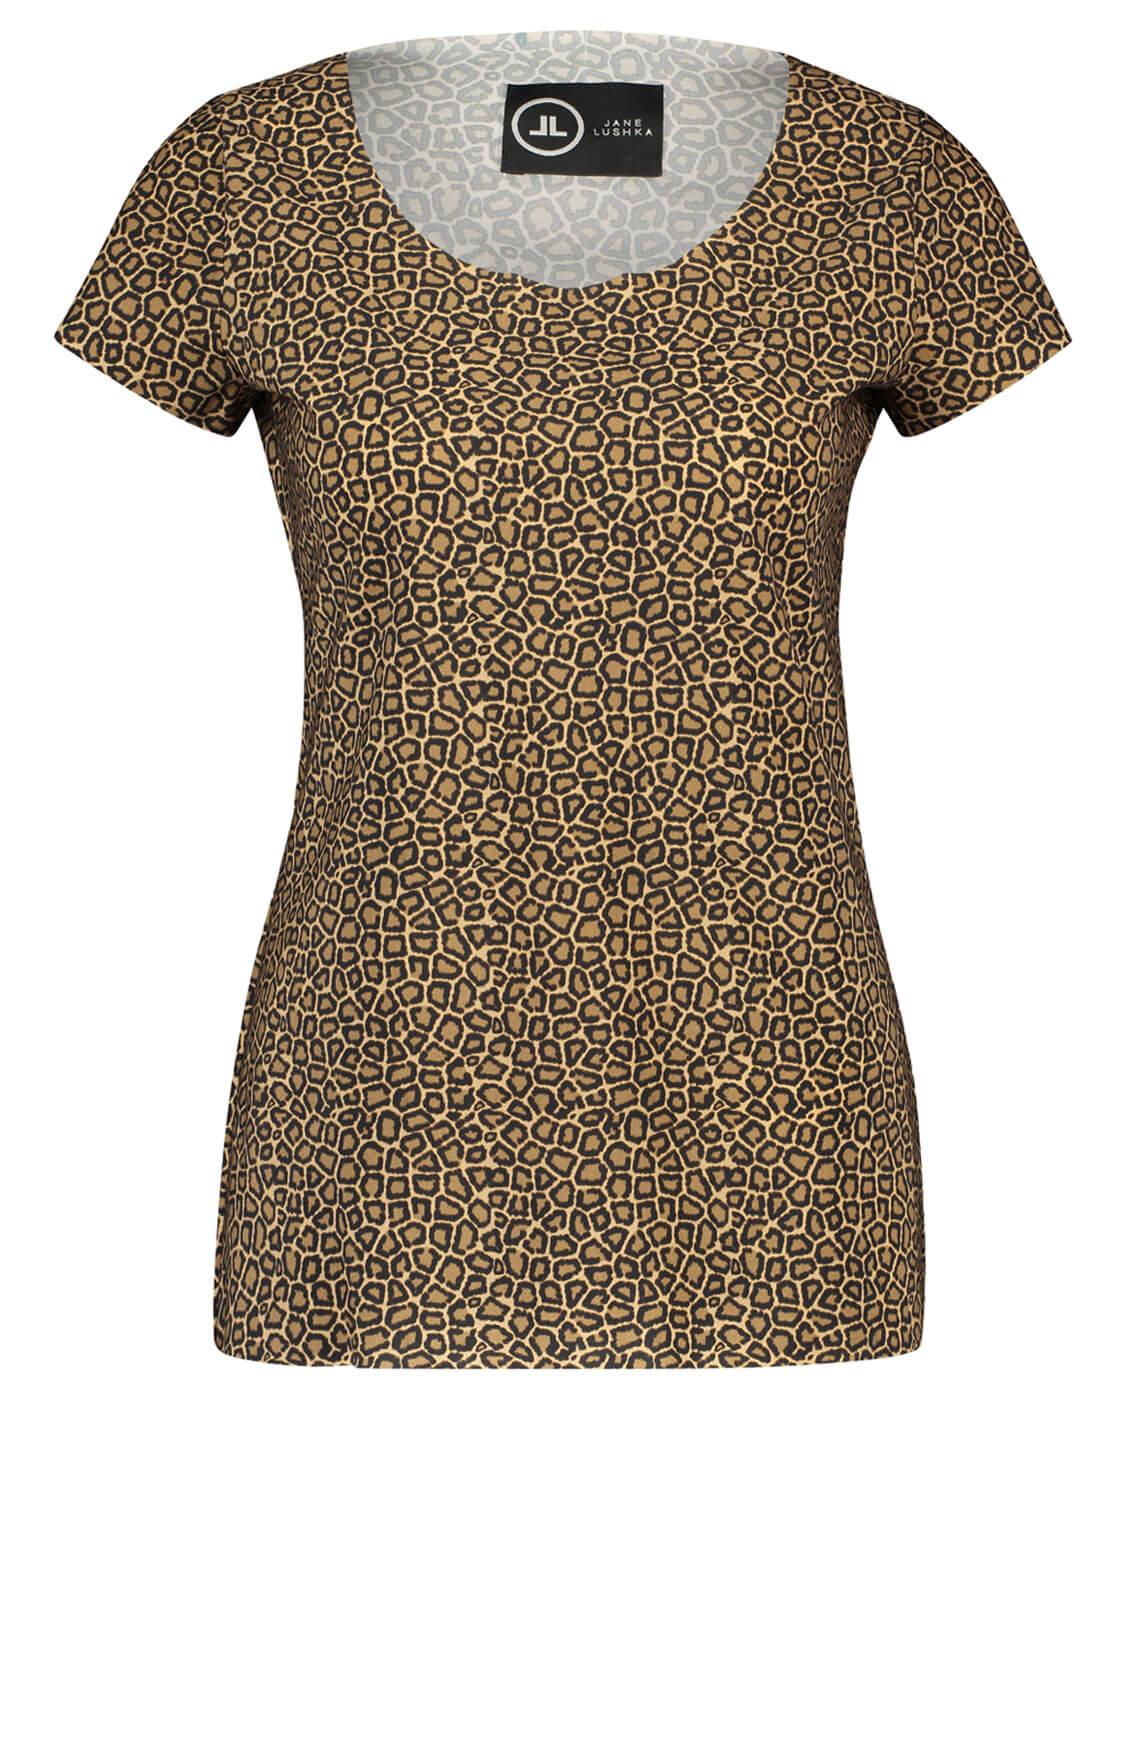 Jane Lushka Dames Panterprint shirt Bruin